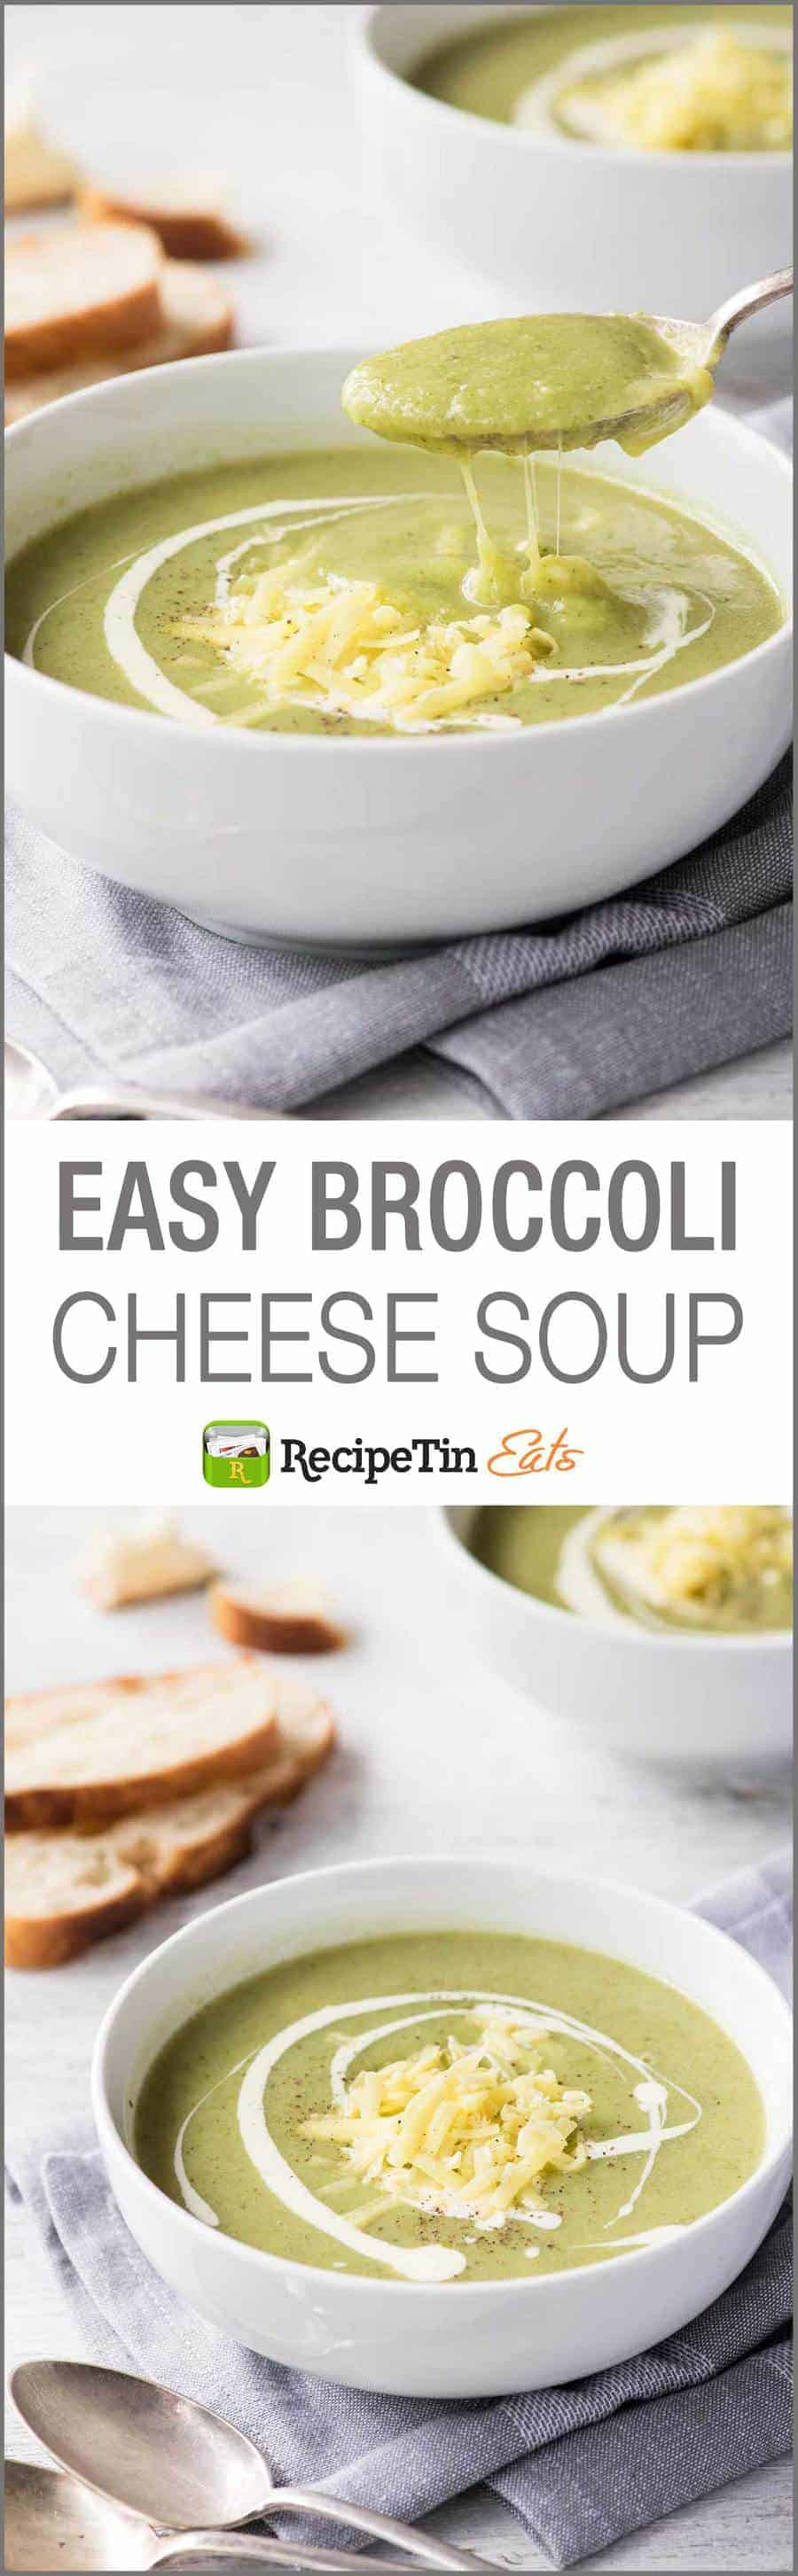 Easy Broccoli Cheese Soup  Easy Broccoli Cheese Soup